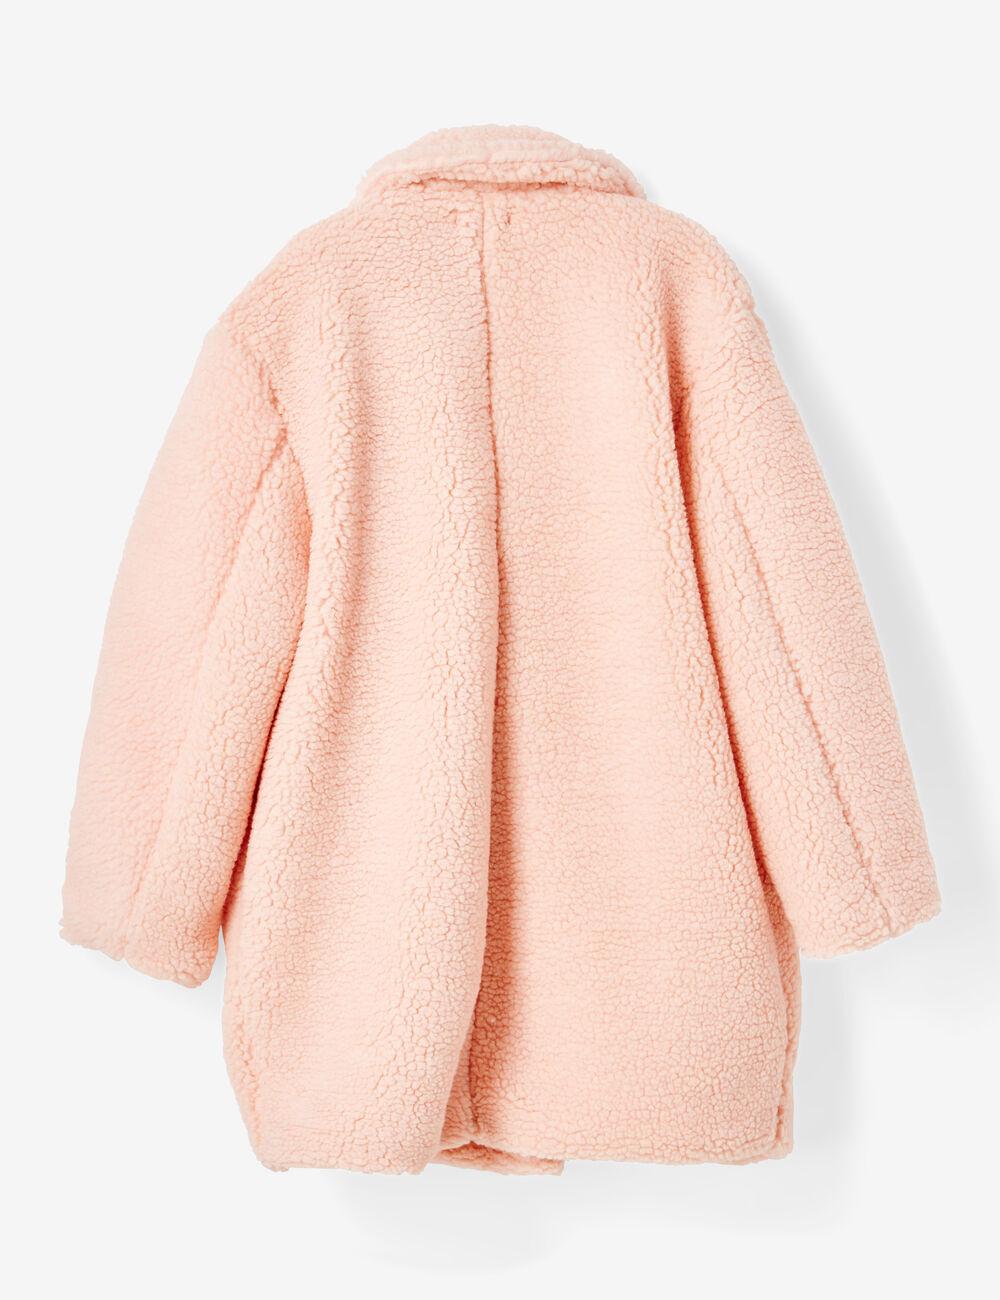 manteau fausse fourrure rose clair femme jennyfer. Black Bedroom Furniture Sets. Home Design Ideas